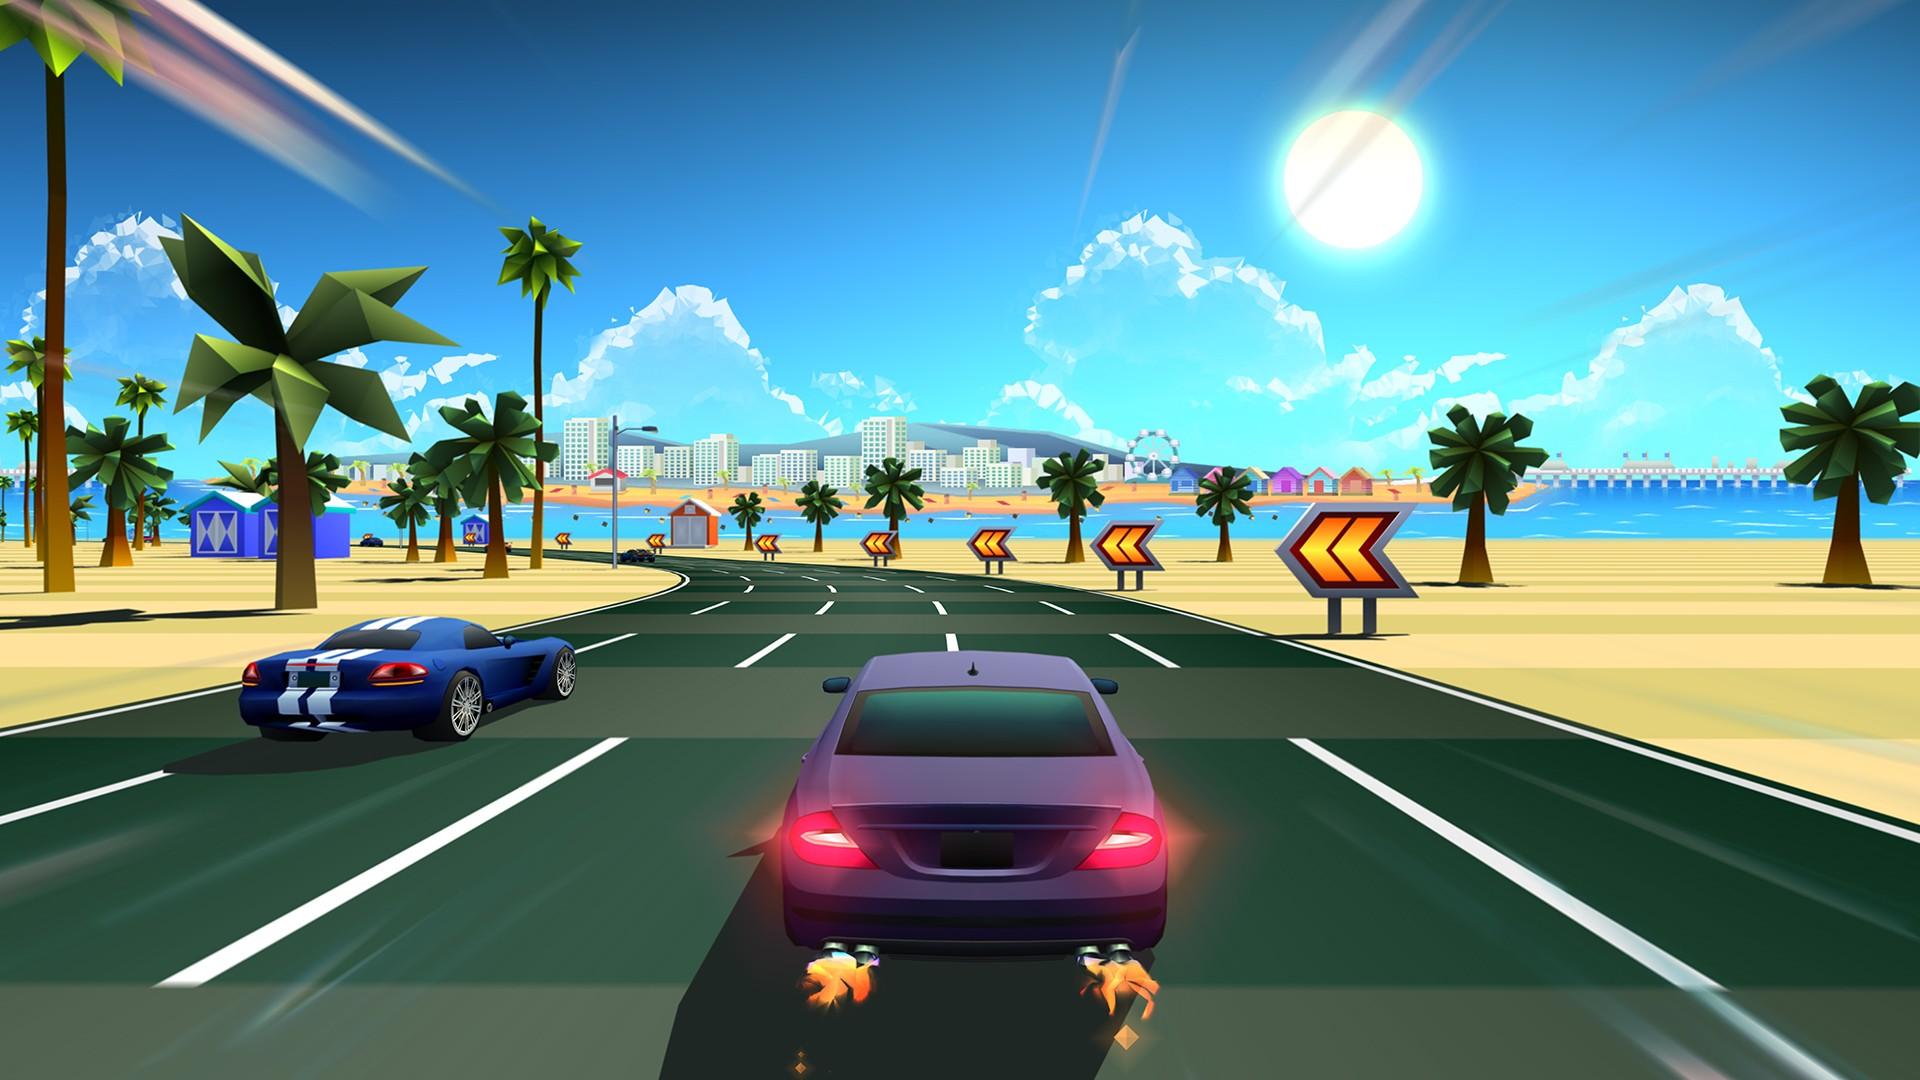 horizon chase - Horizon Chase: Game hay trong tuần